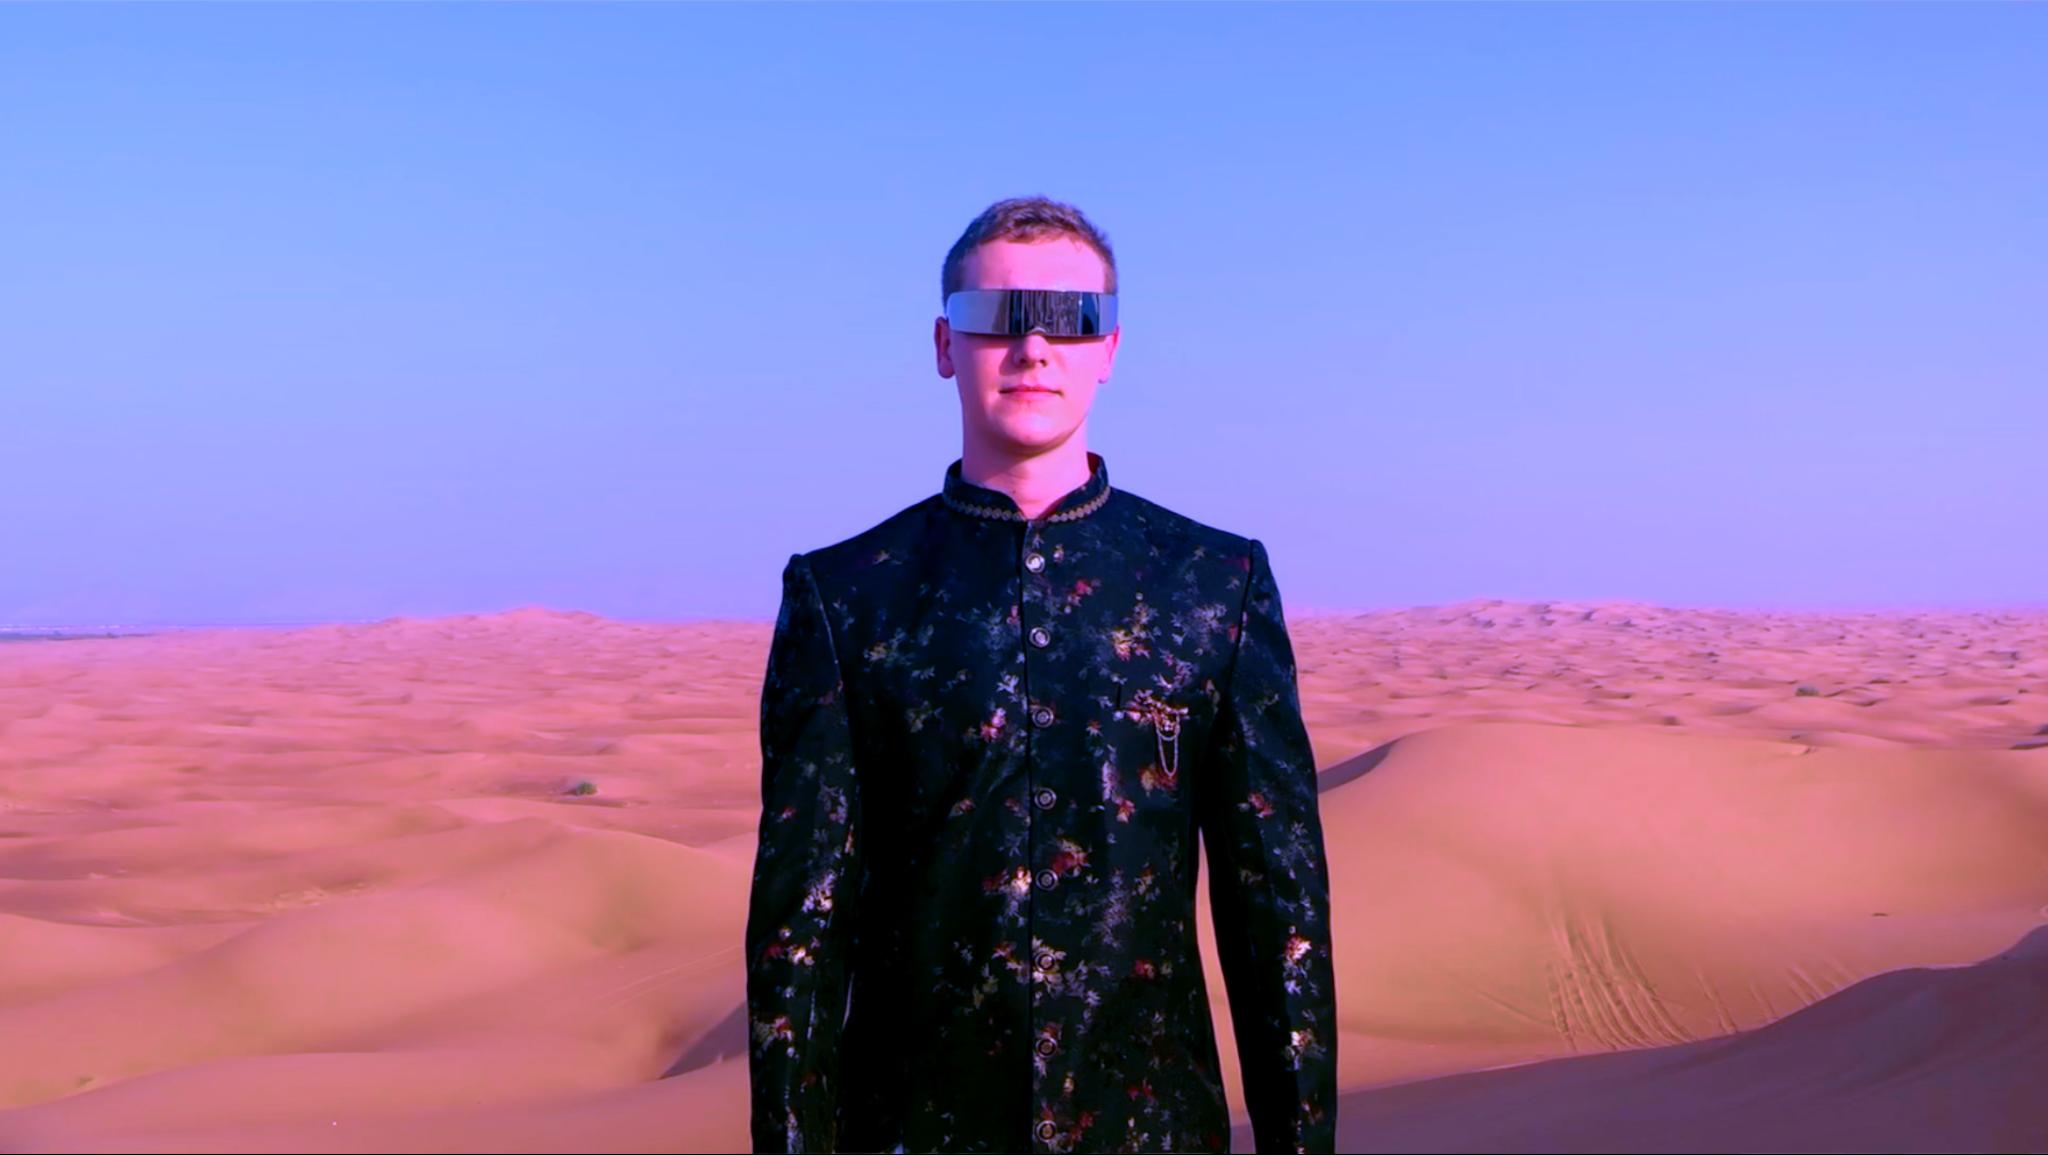 Music Video: Stereo Passion - CJ Brogan